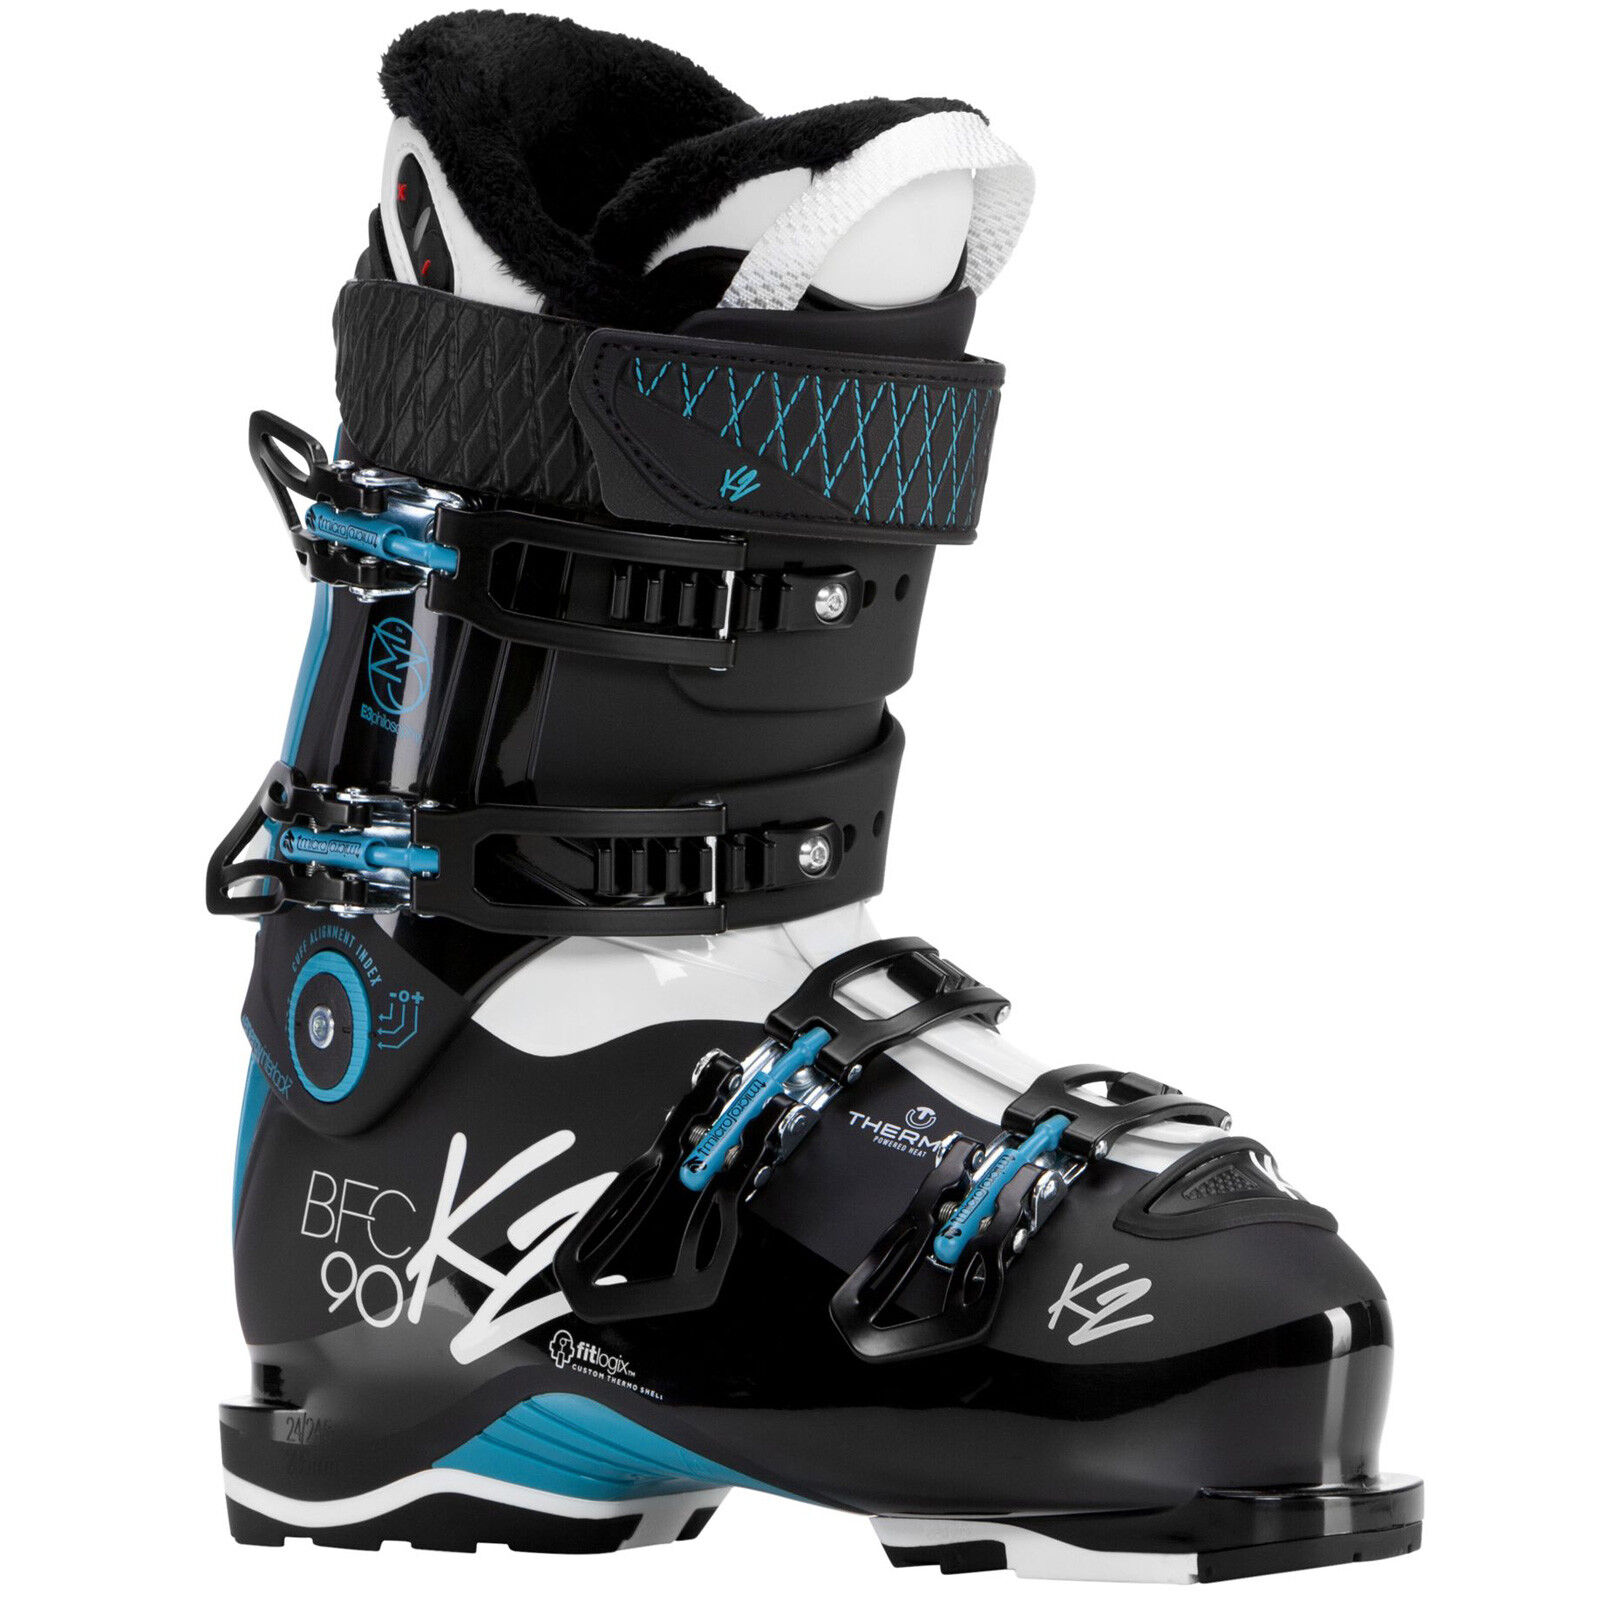 K2 Bfc Walk W 90 Heat Heatable DaSie -skischuhe (103 mm) Ski Stiefel Ski Stiefel